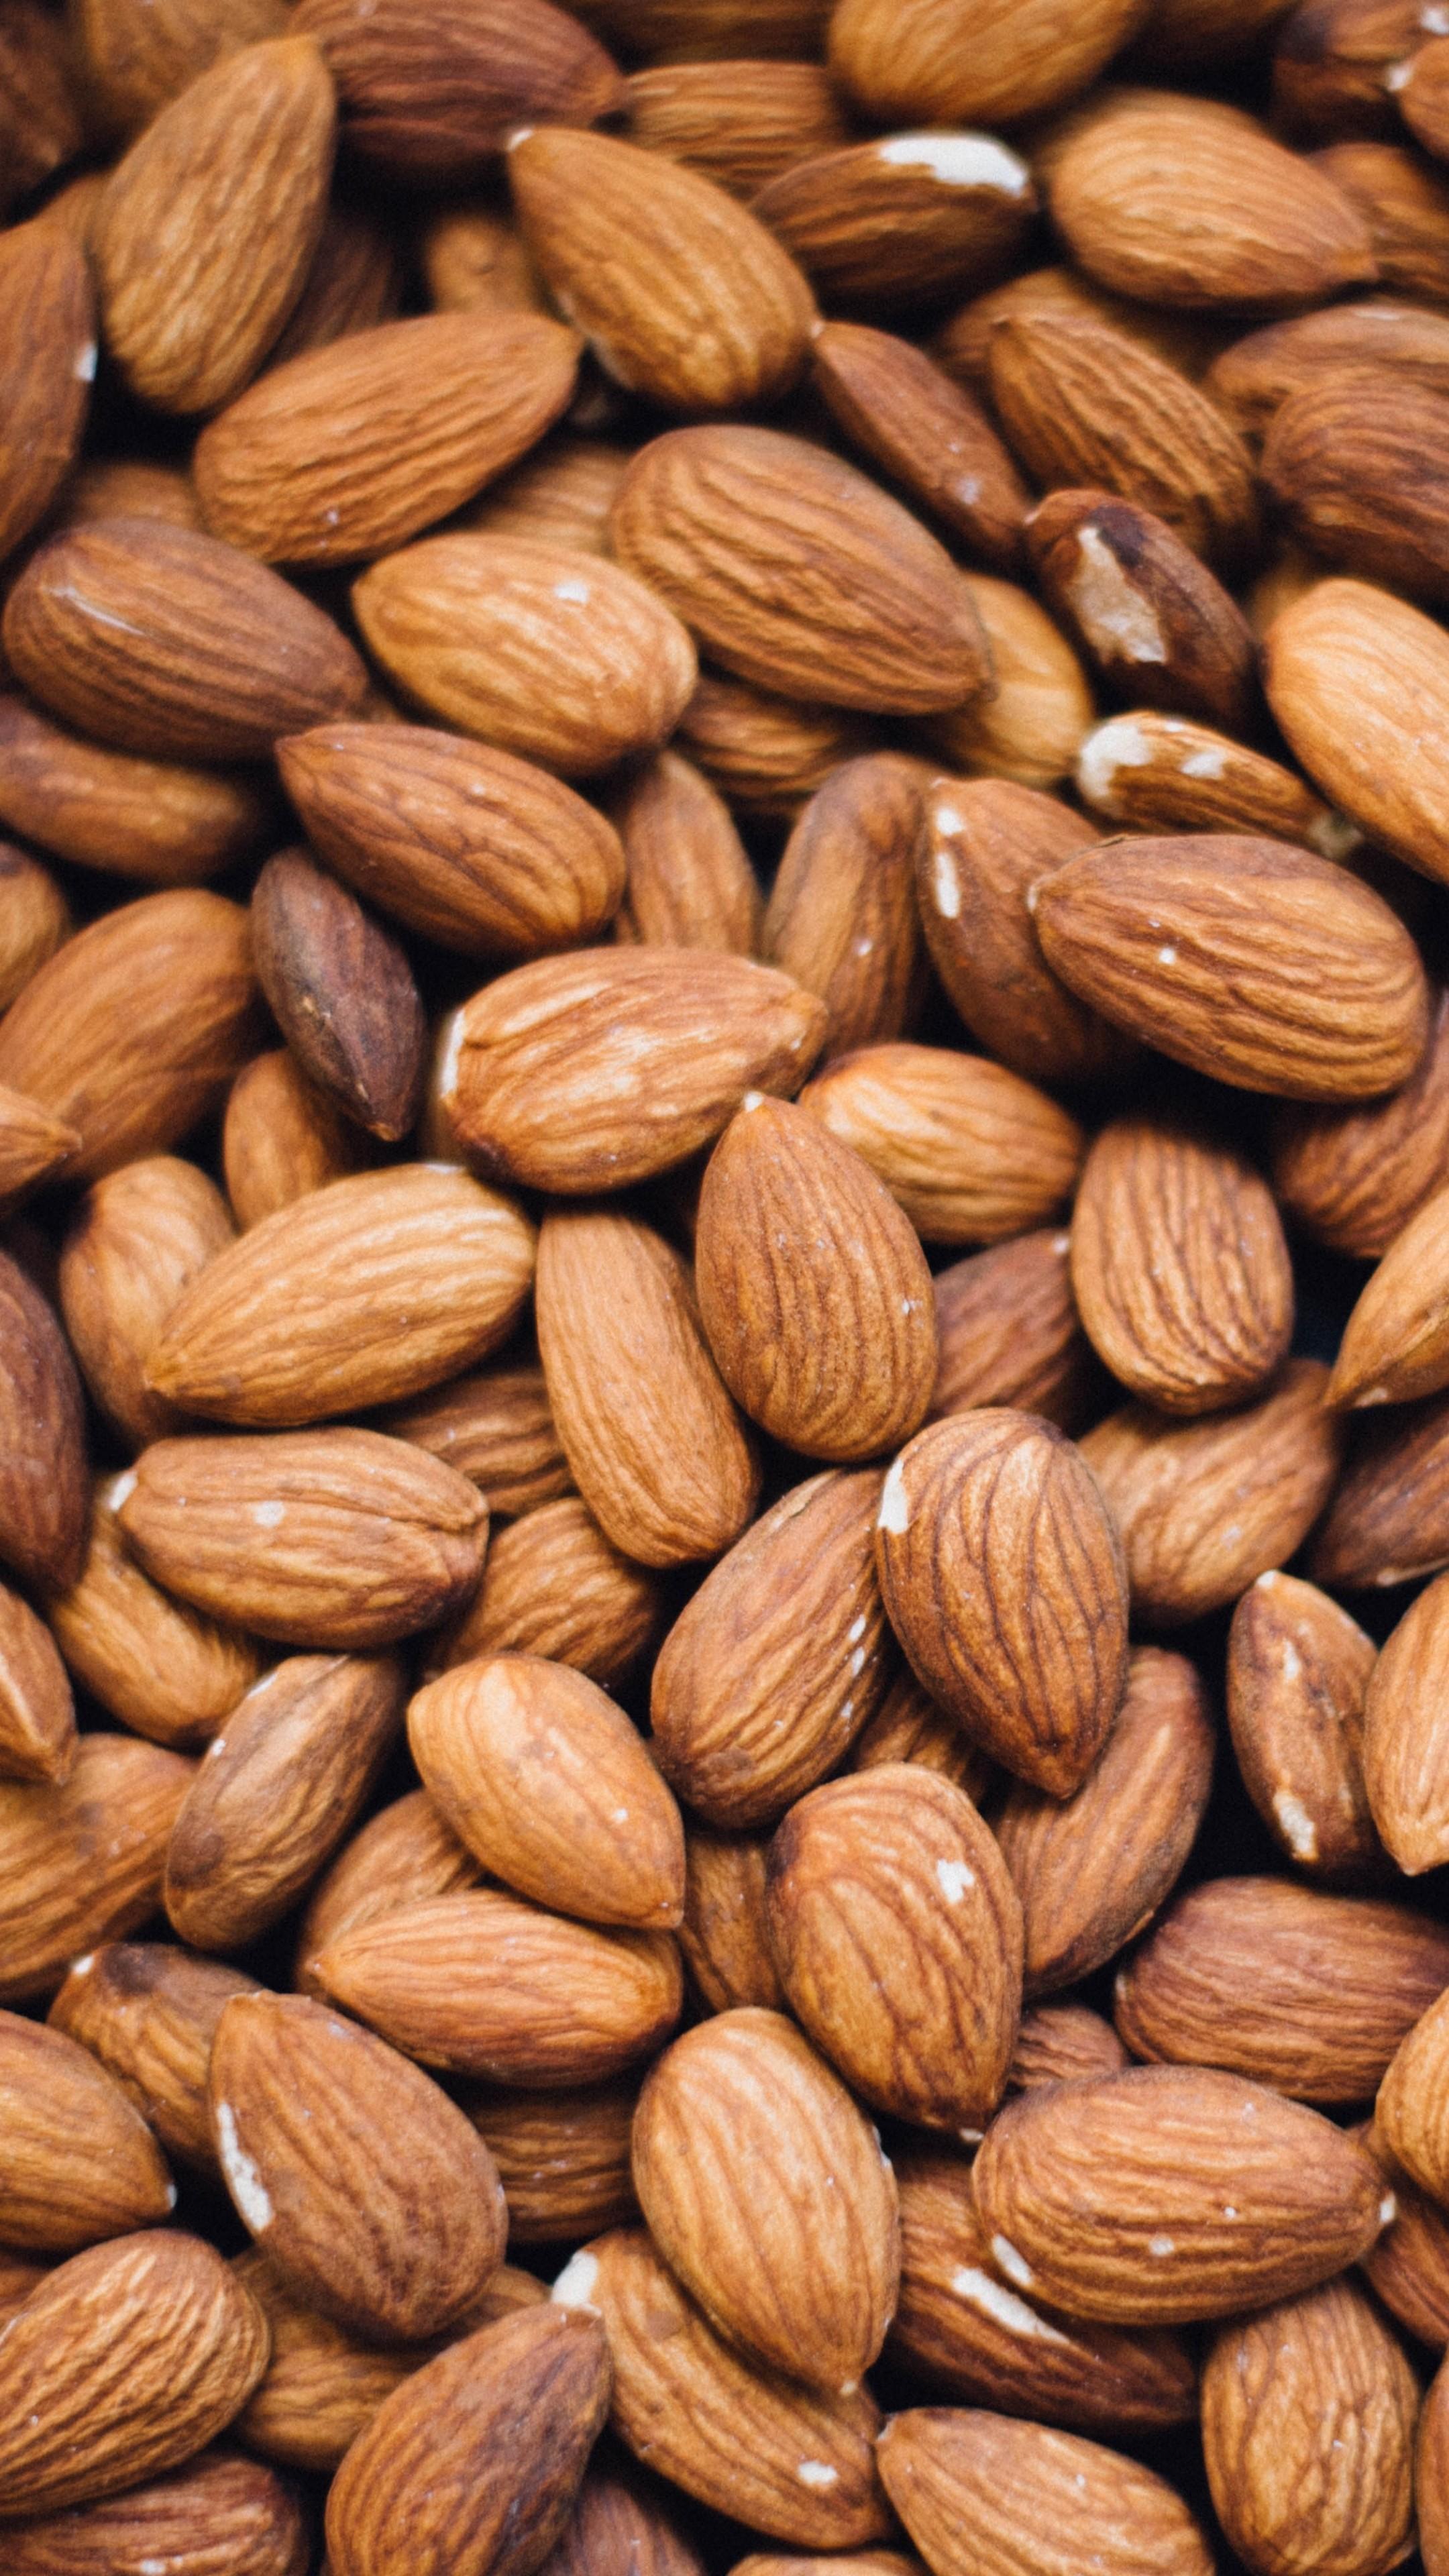 almonds nuts core wallpaper - [2160x3840]